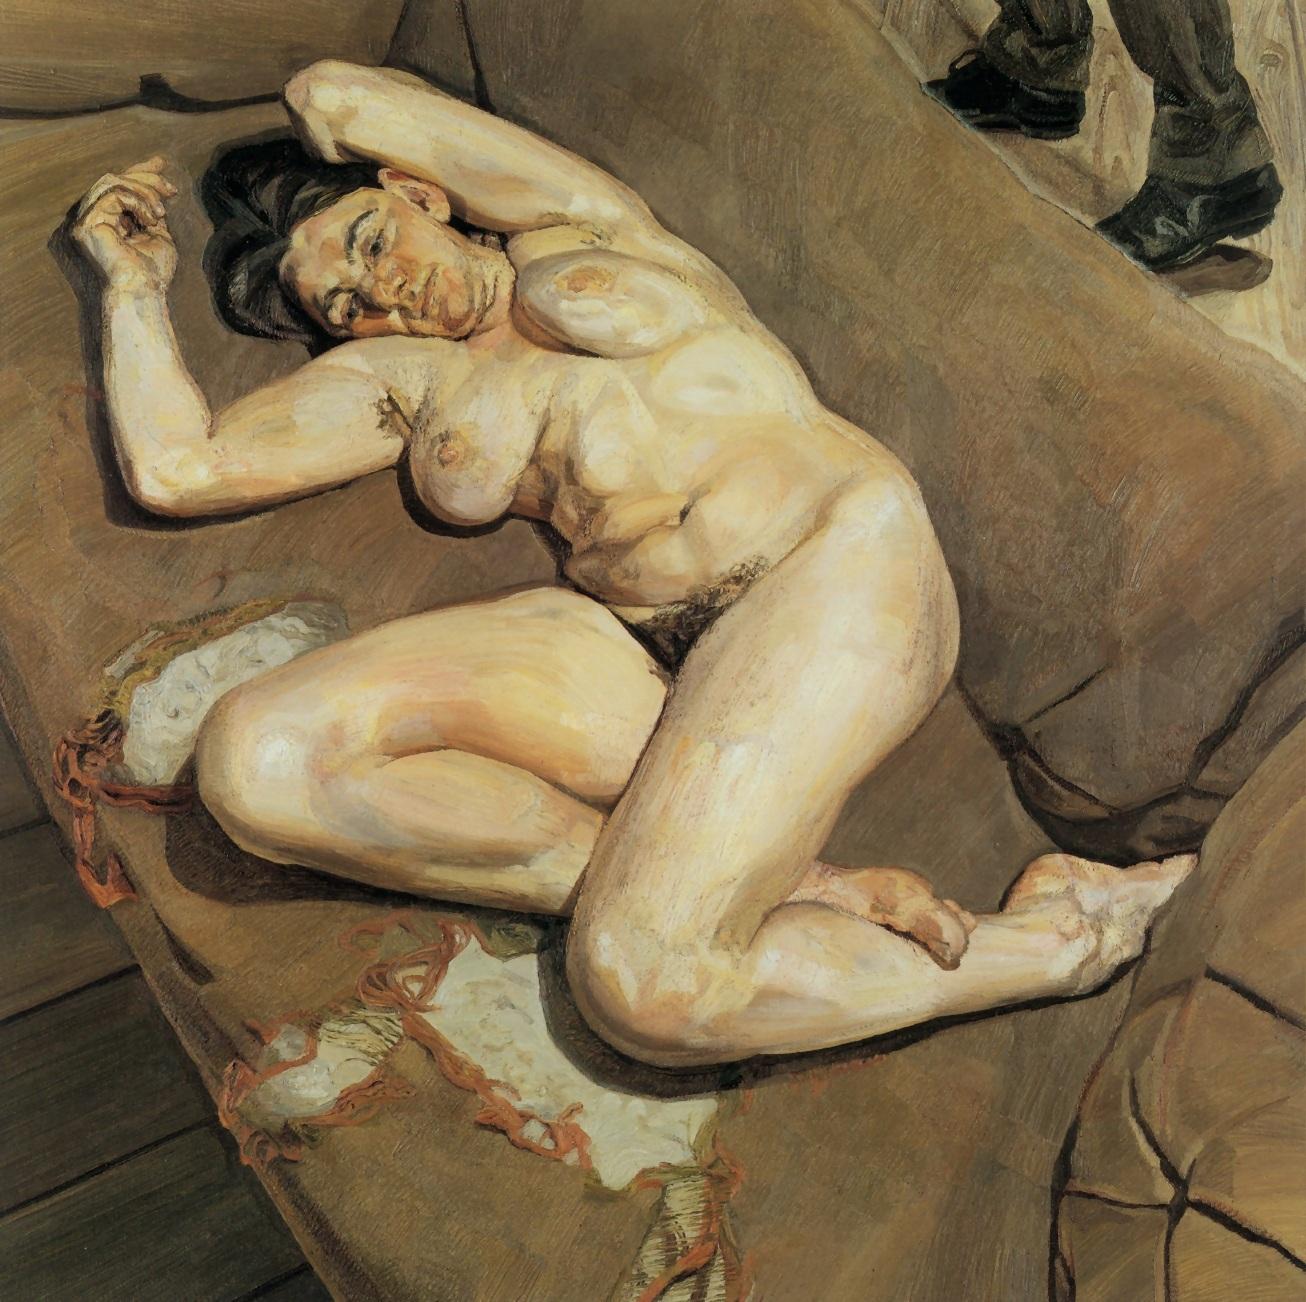 арт хаус эротика смотреть онлайн бесплатно